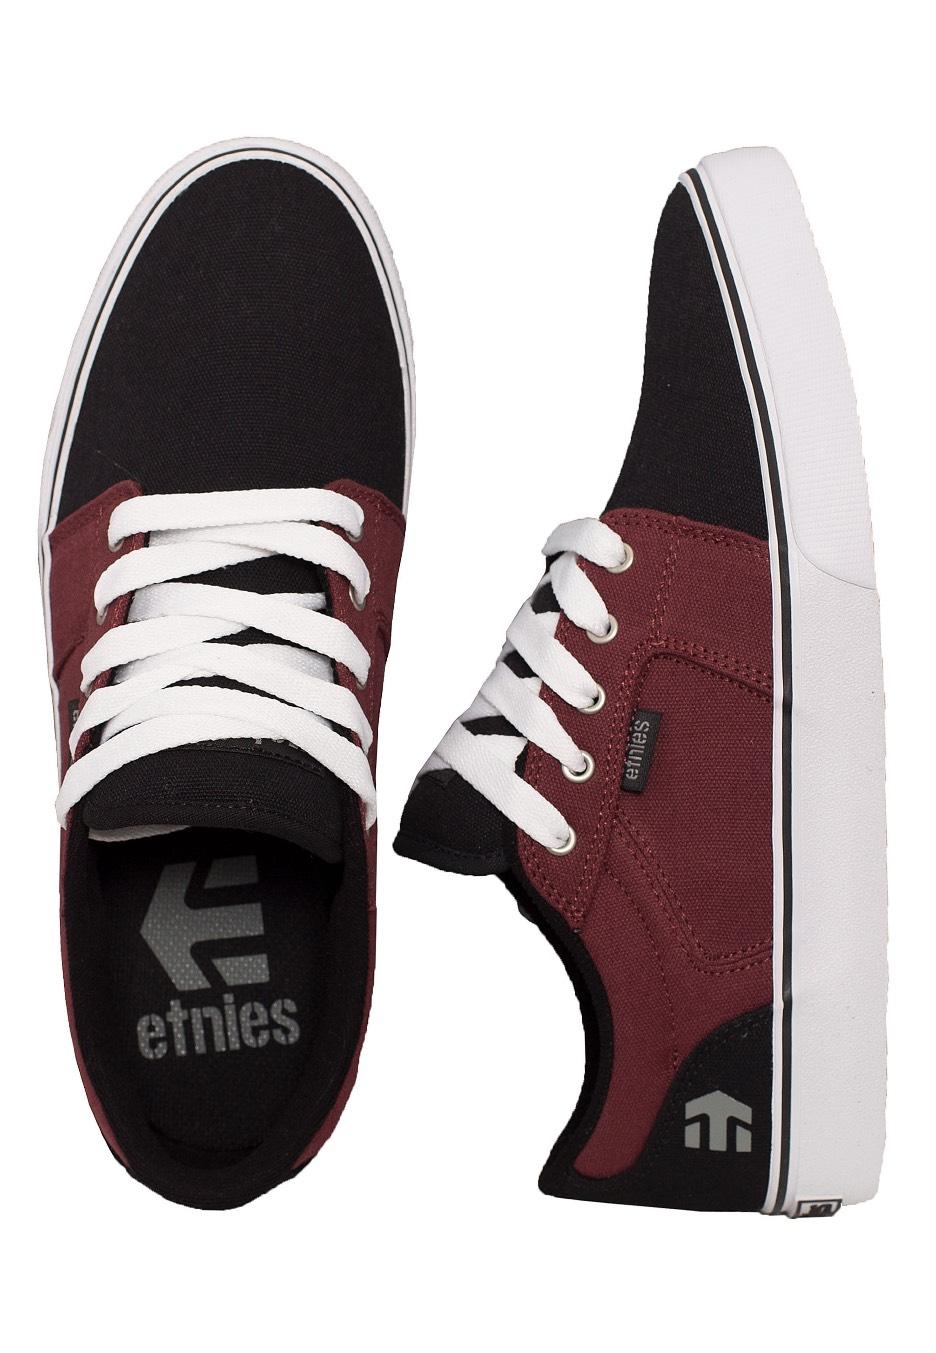 Etnies Barge LS BlackWhiteBurgundy Shoes